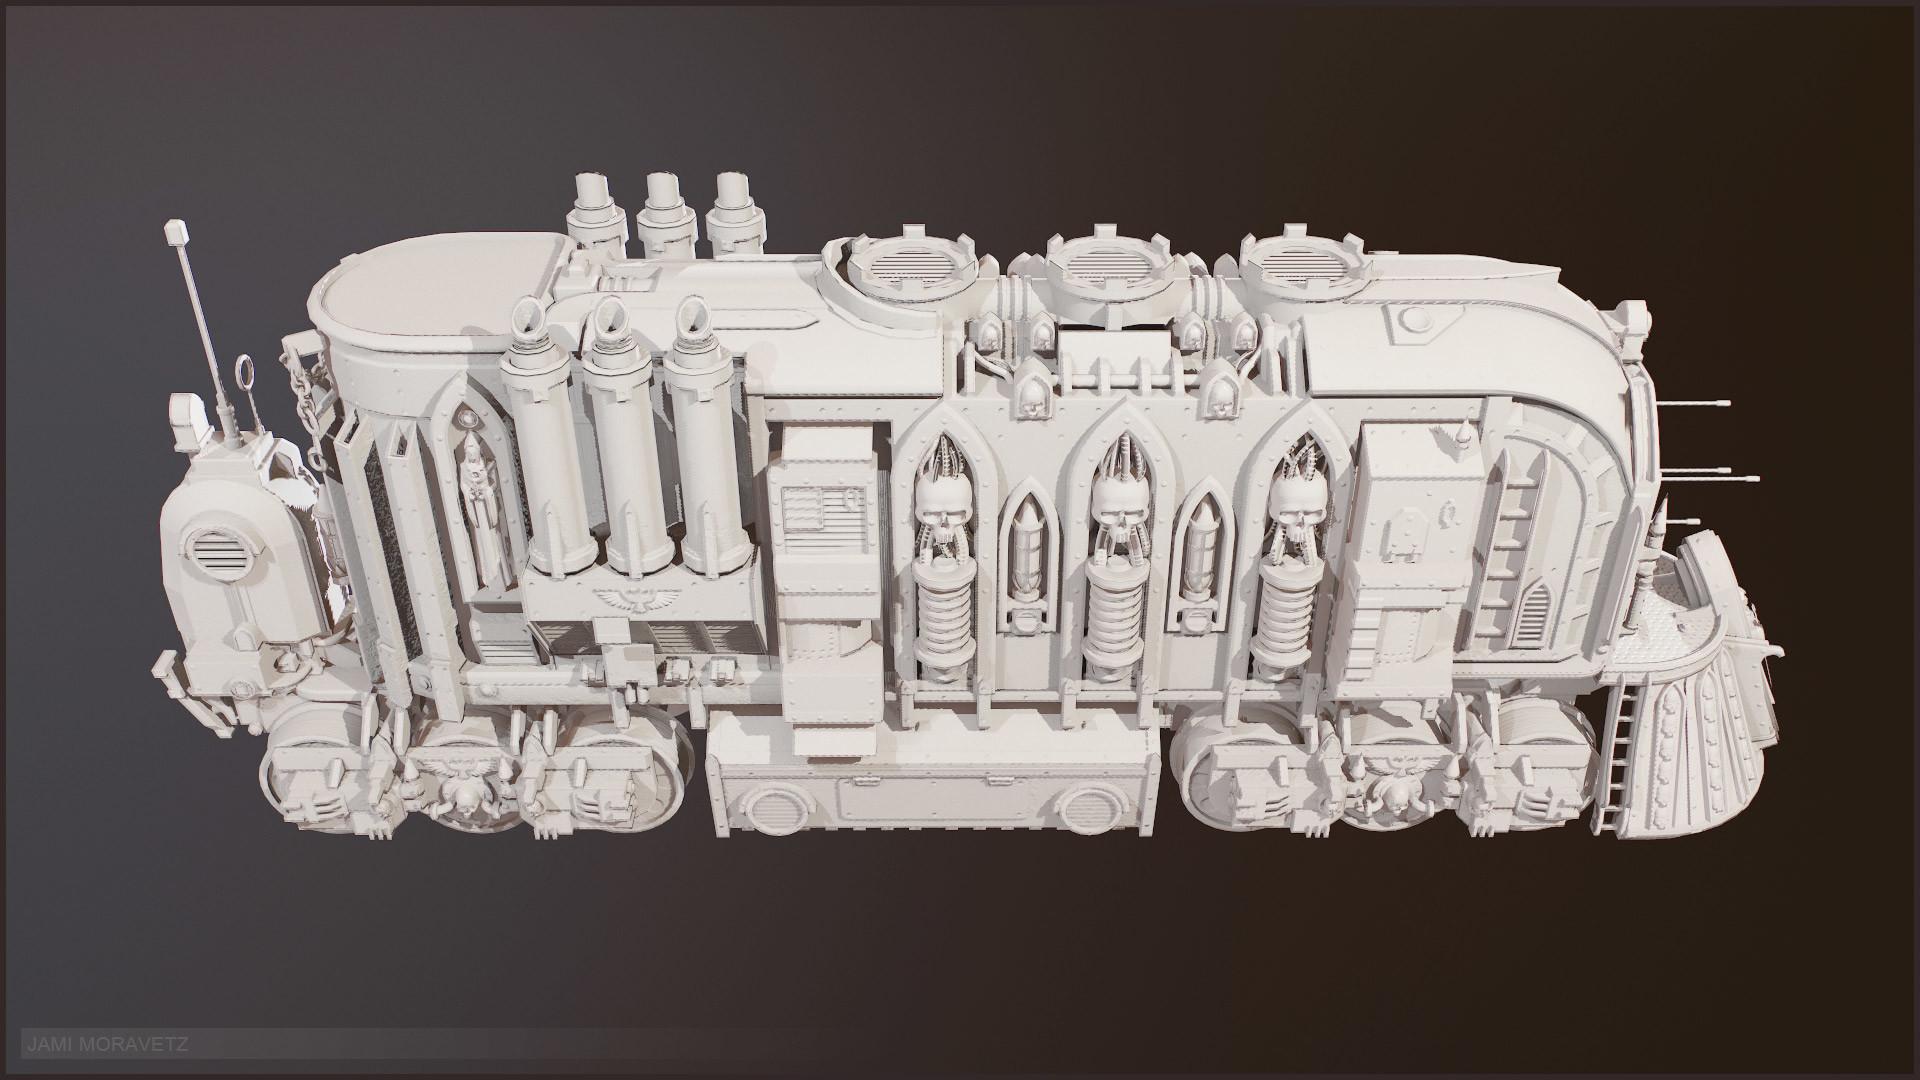 Jami moravetz jami moravetz warhammer40kultramarinetrain whitet